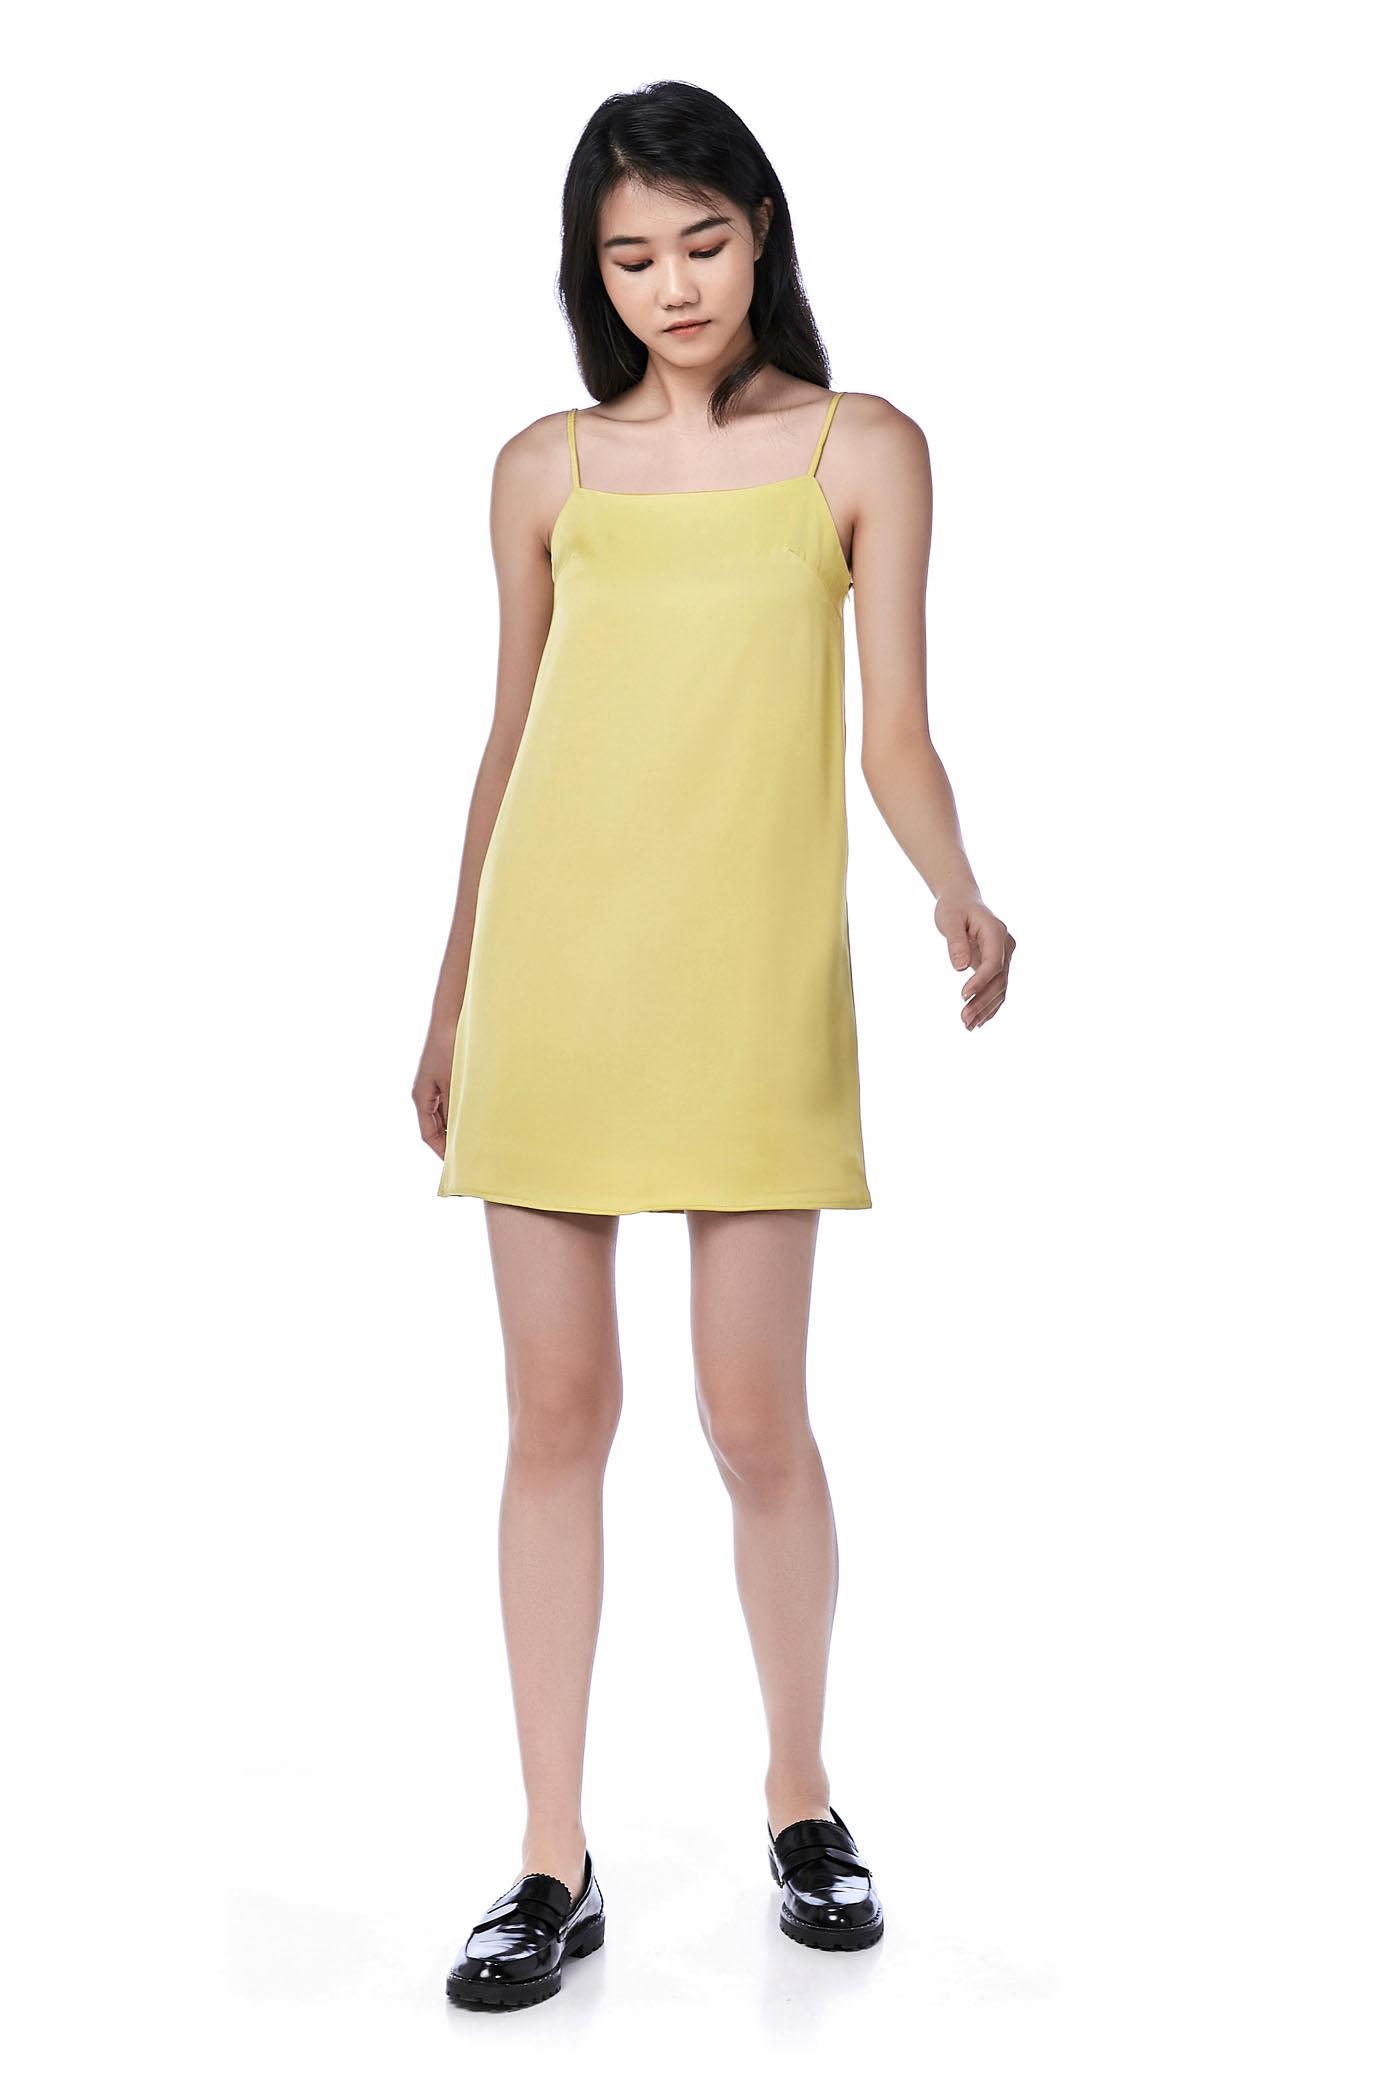 Mykela Cami Mini Dress